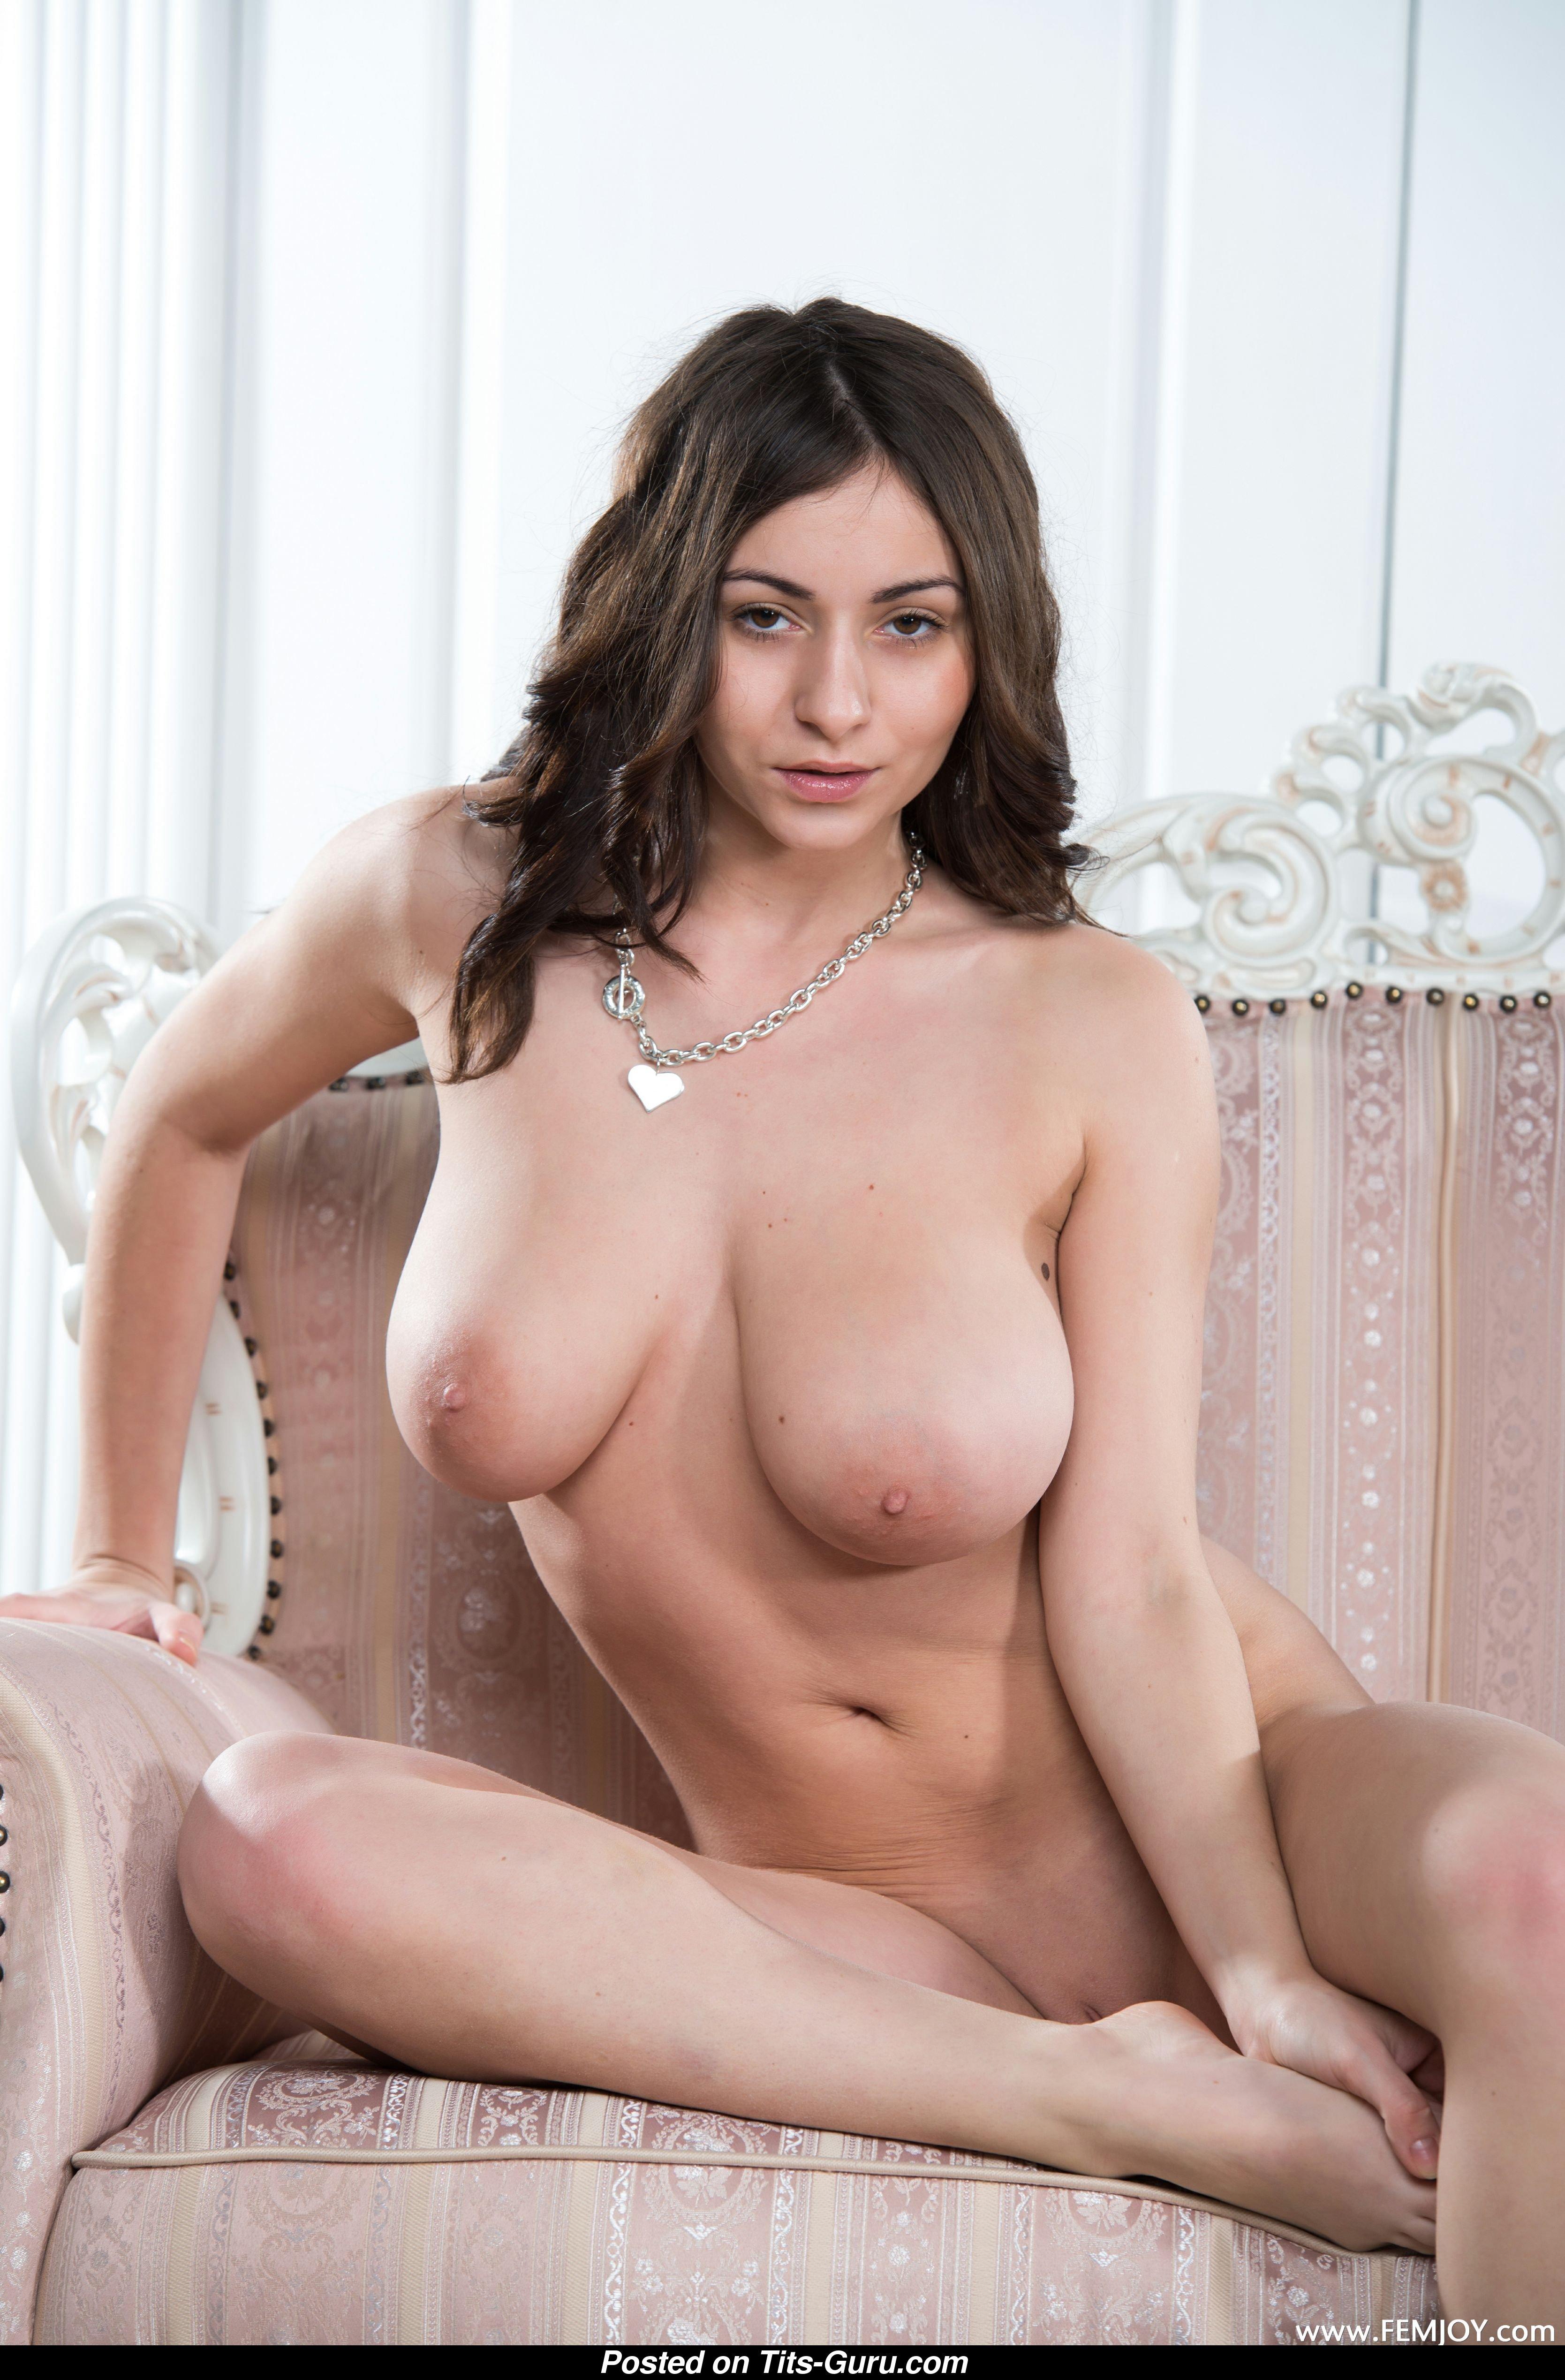 Size 38 naked tits